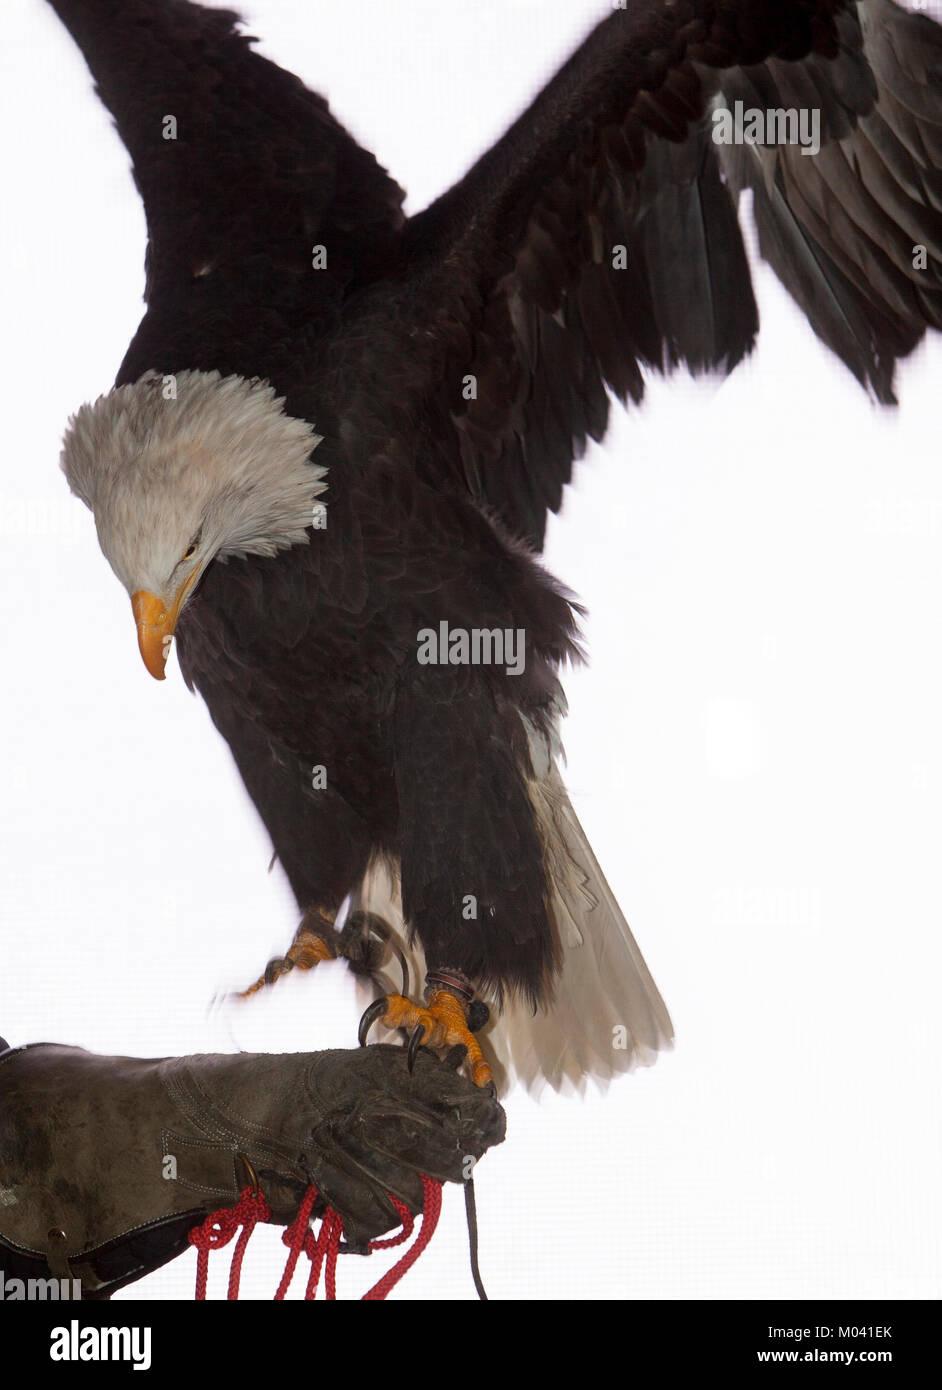 Edinburgh, Scotland. 18th January, 2018. Edinburgh, Scotland, 53rd Wildlife Photographer of the Year Exhibition. - Stock Image